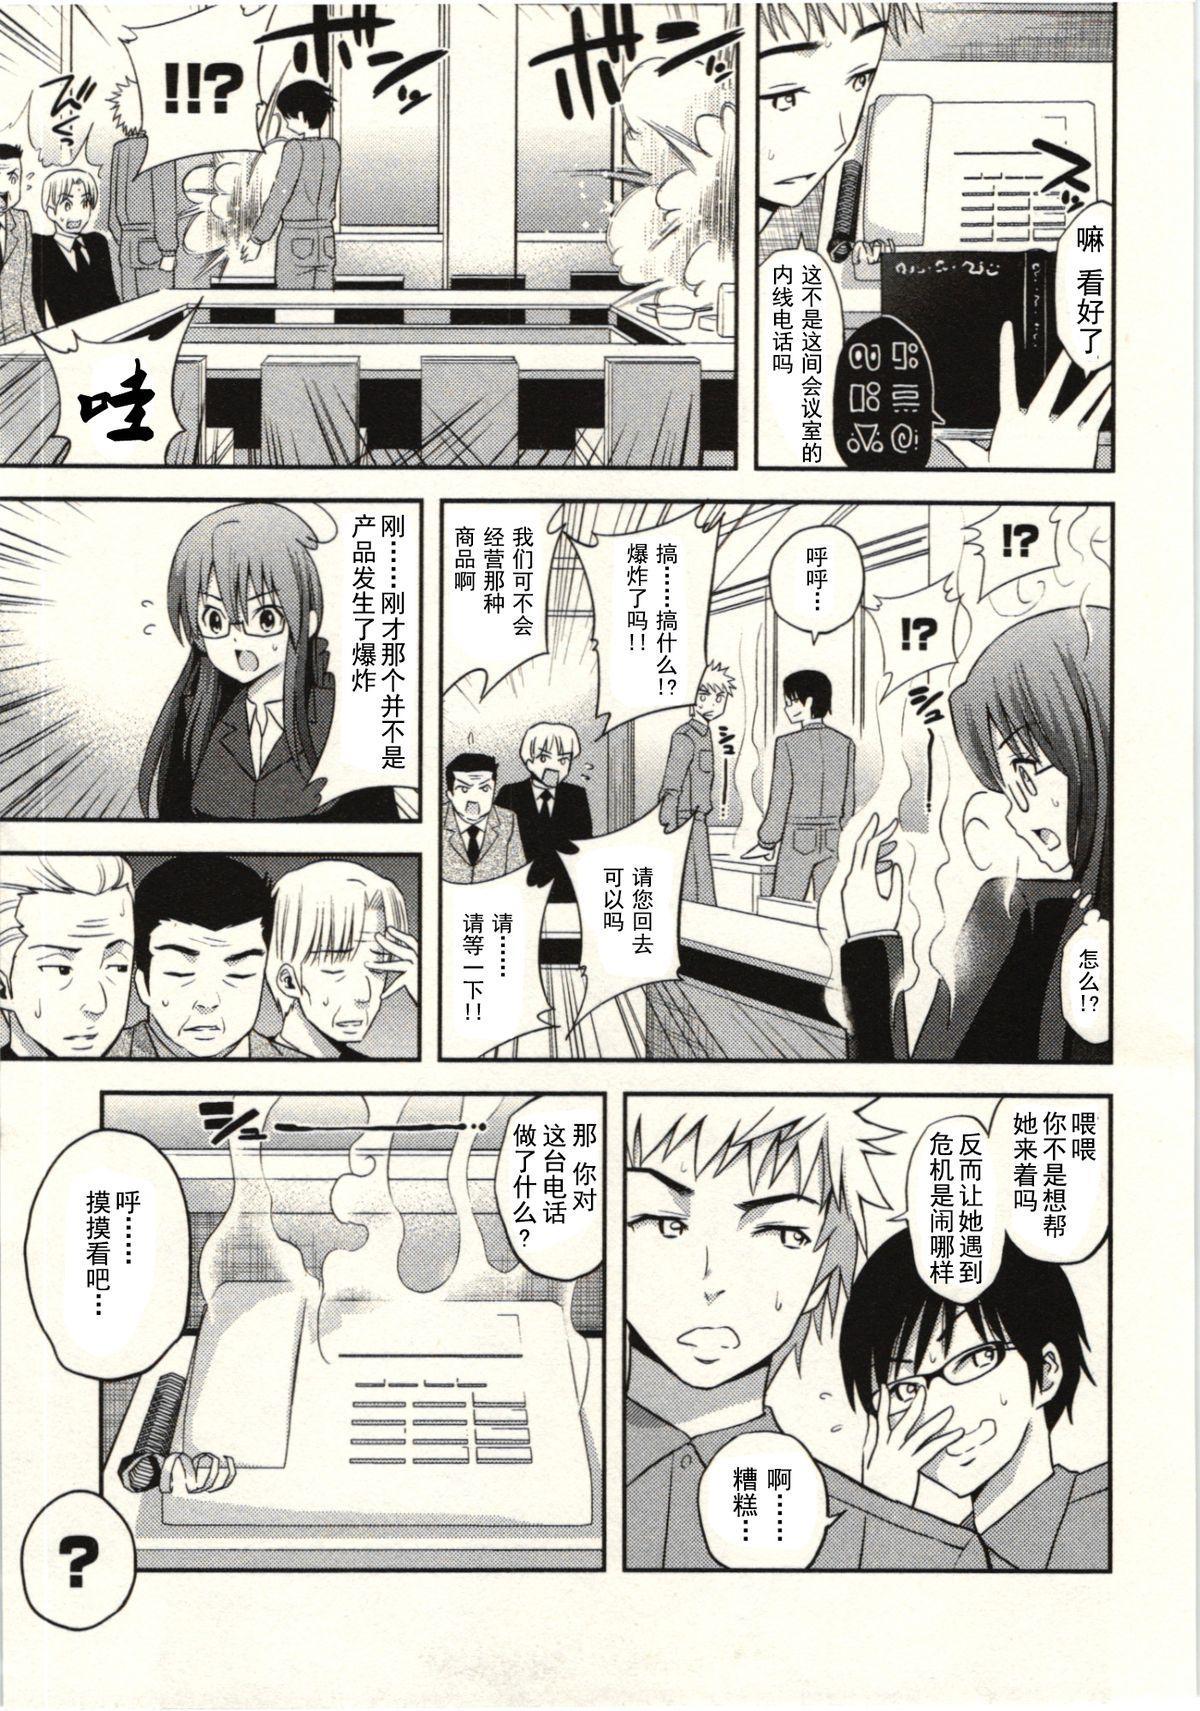 Tadashii Majutsu no Asobikata - The right way of playing of magic. 149